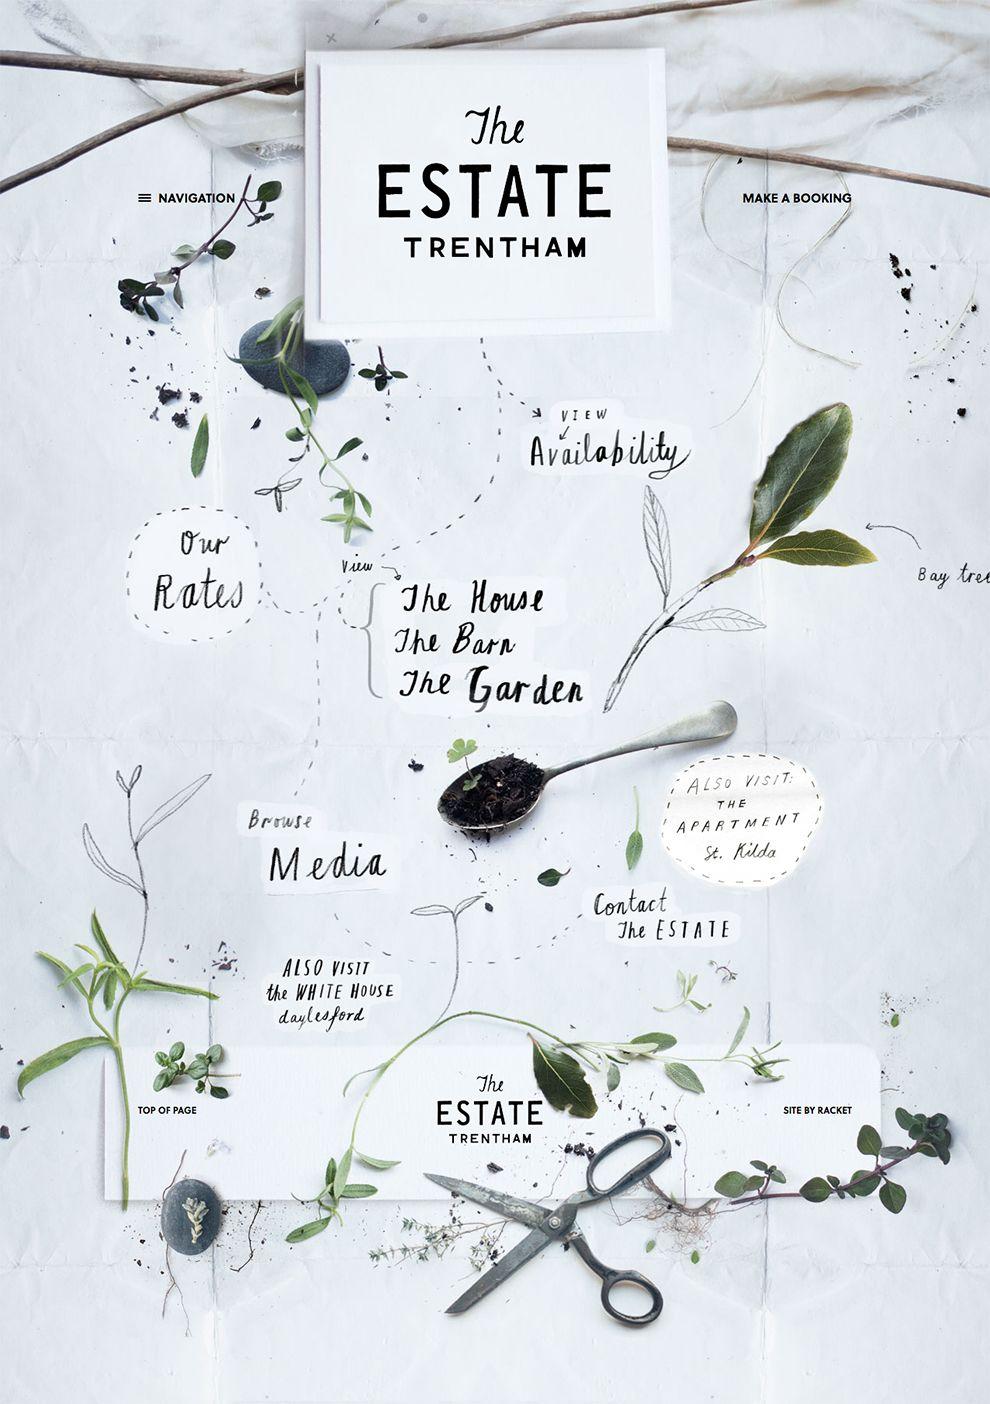 The Estate Trentham Stunning Homepage